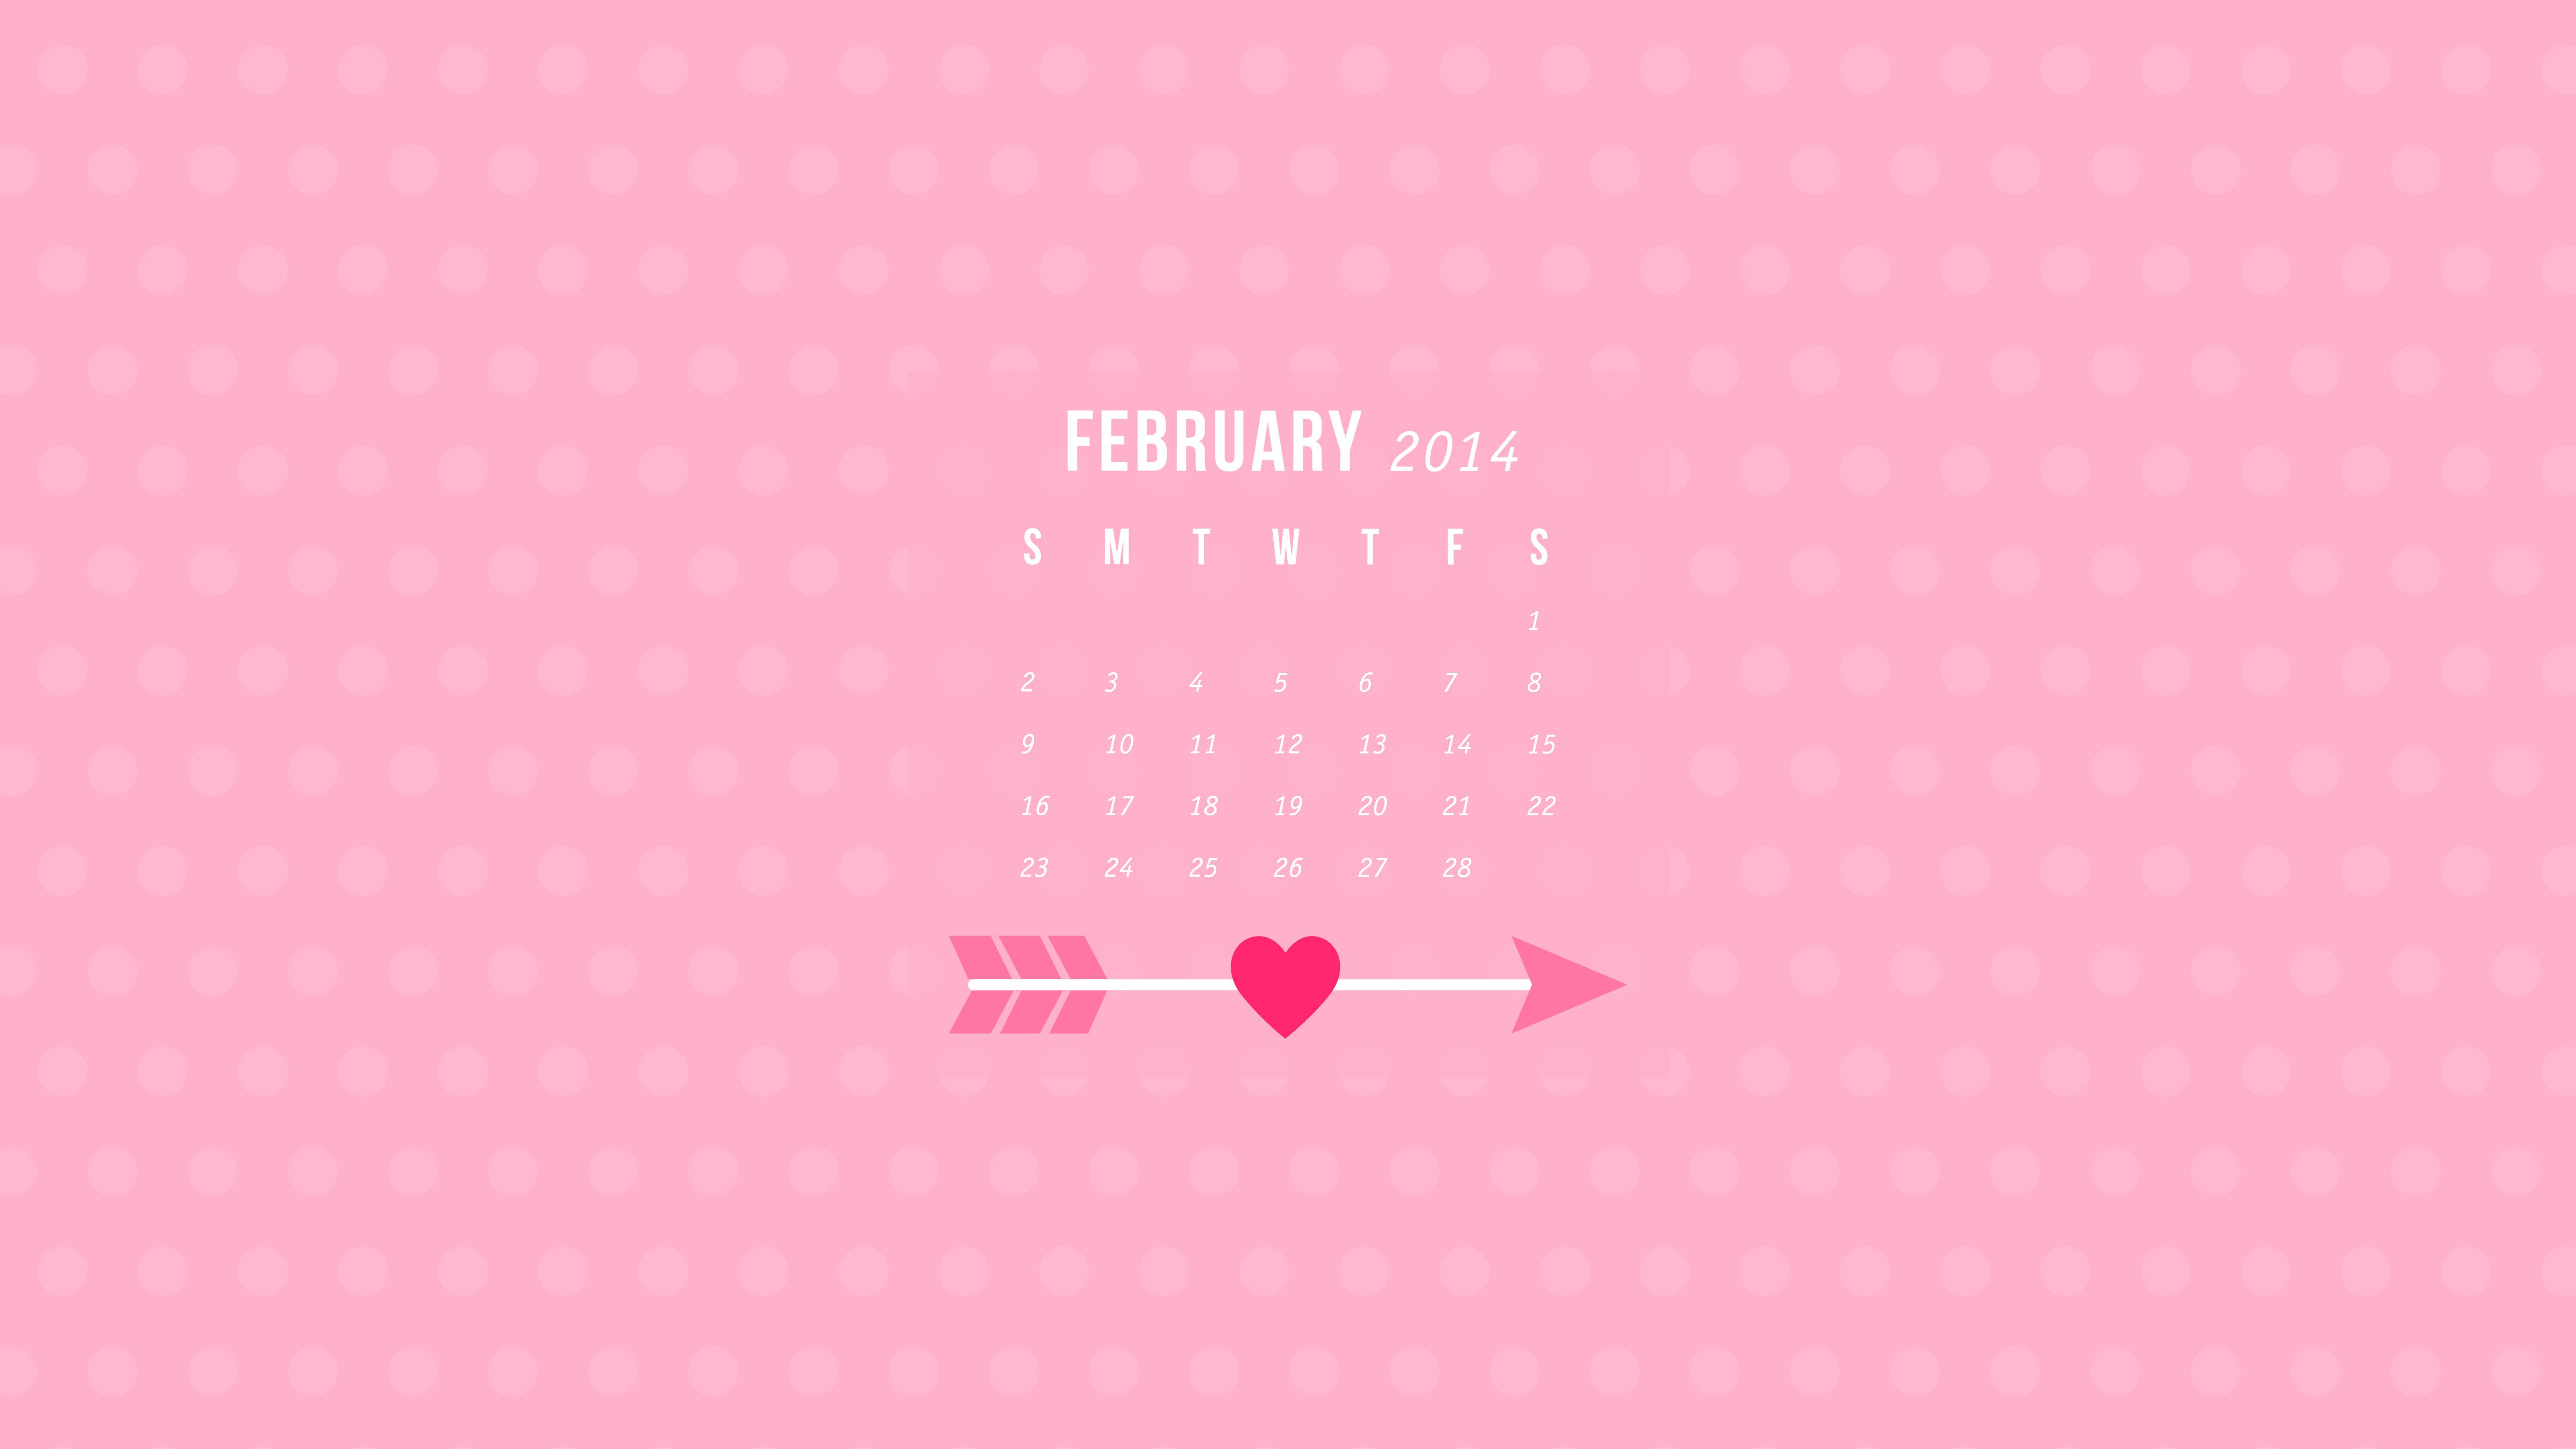 Feb_2014_2560x1440_cal